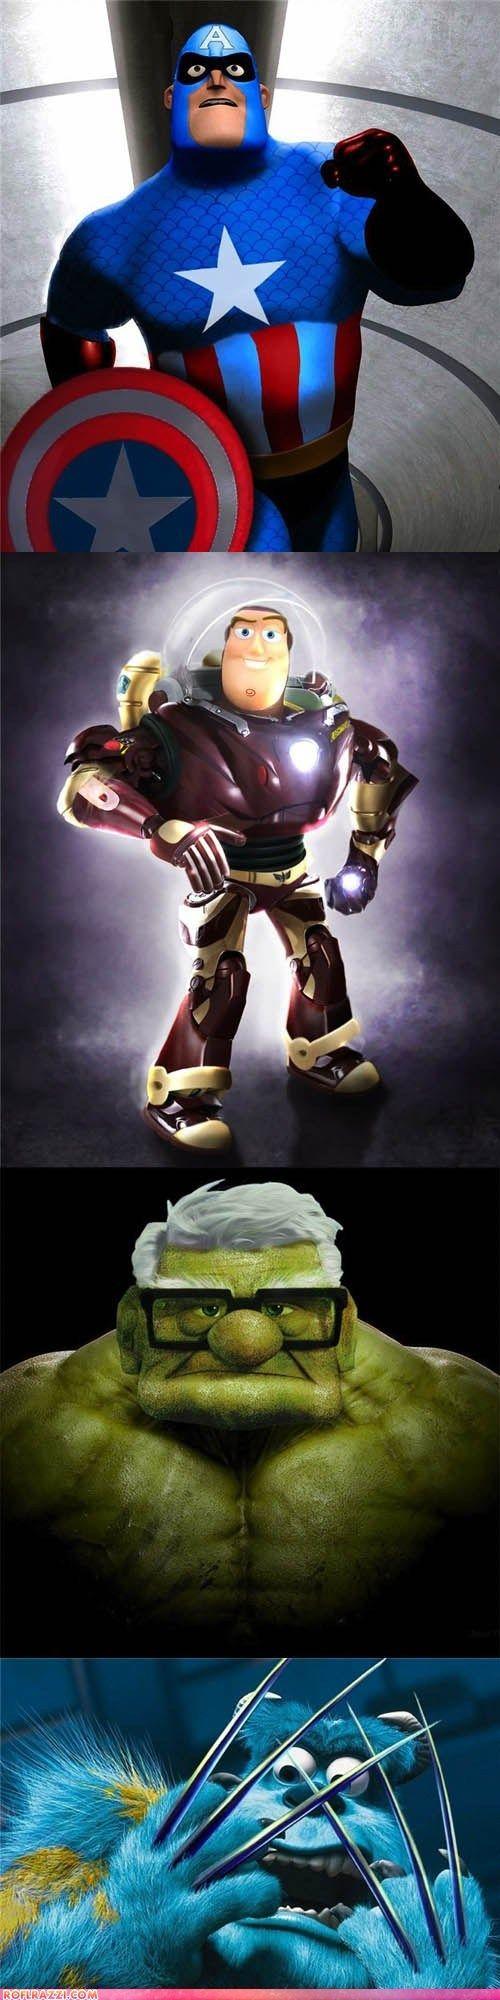 Marvel Superhero/Disney Hybrids! Awesome.